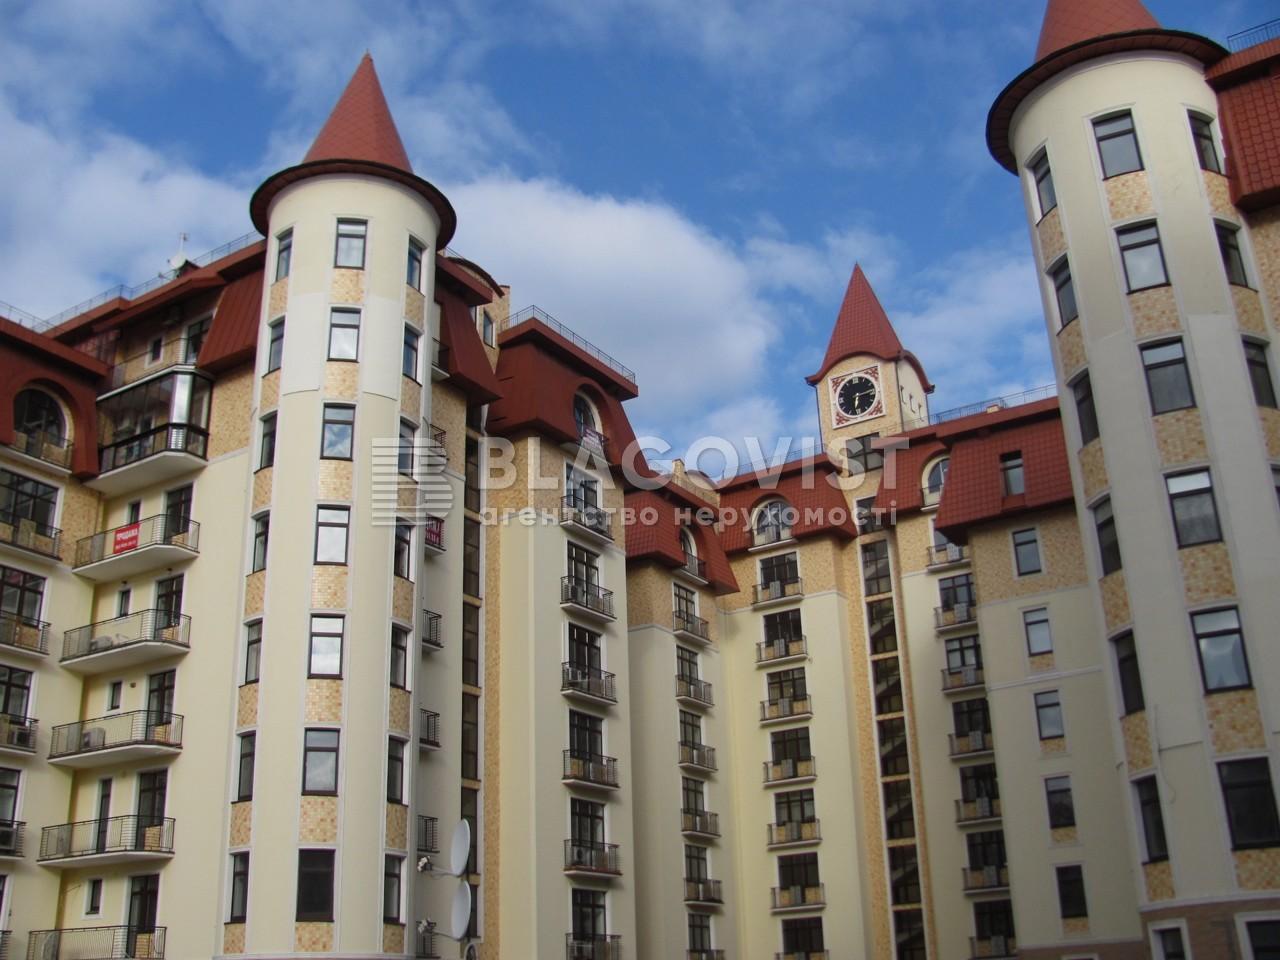 Квартира P-17597, Протасів Яр, 8, Київ - Фото 7